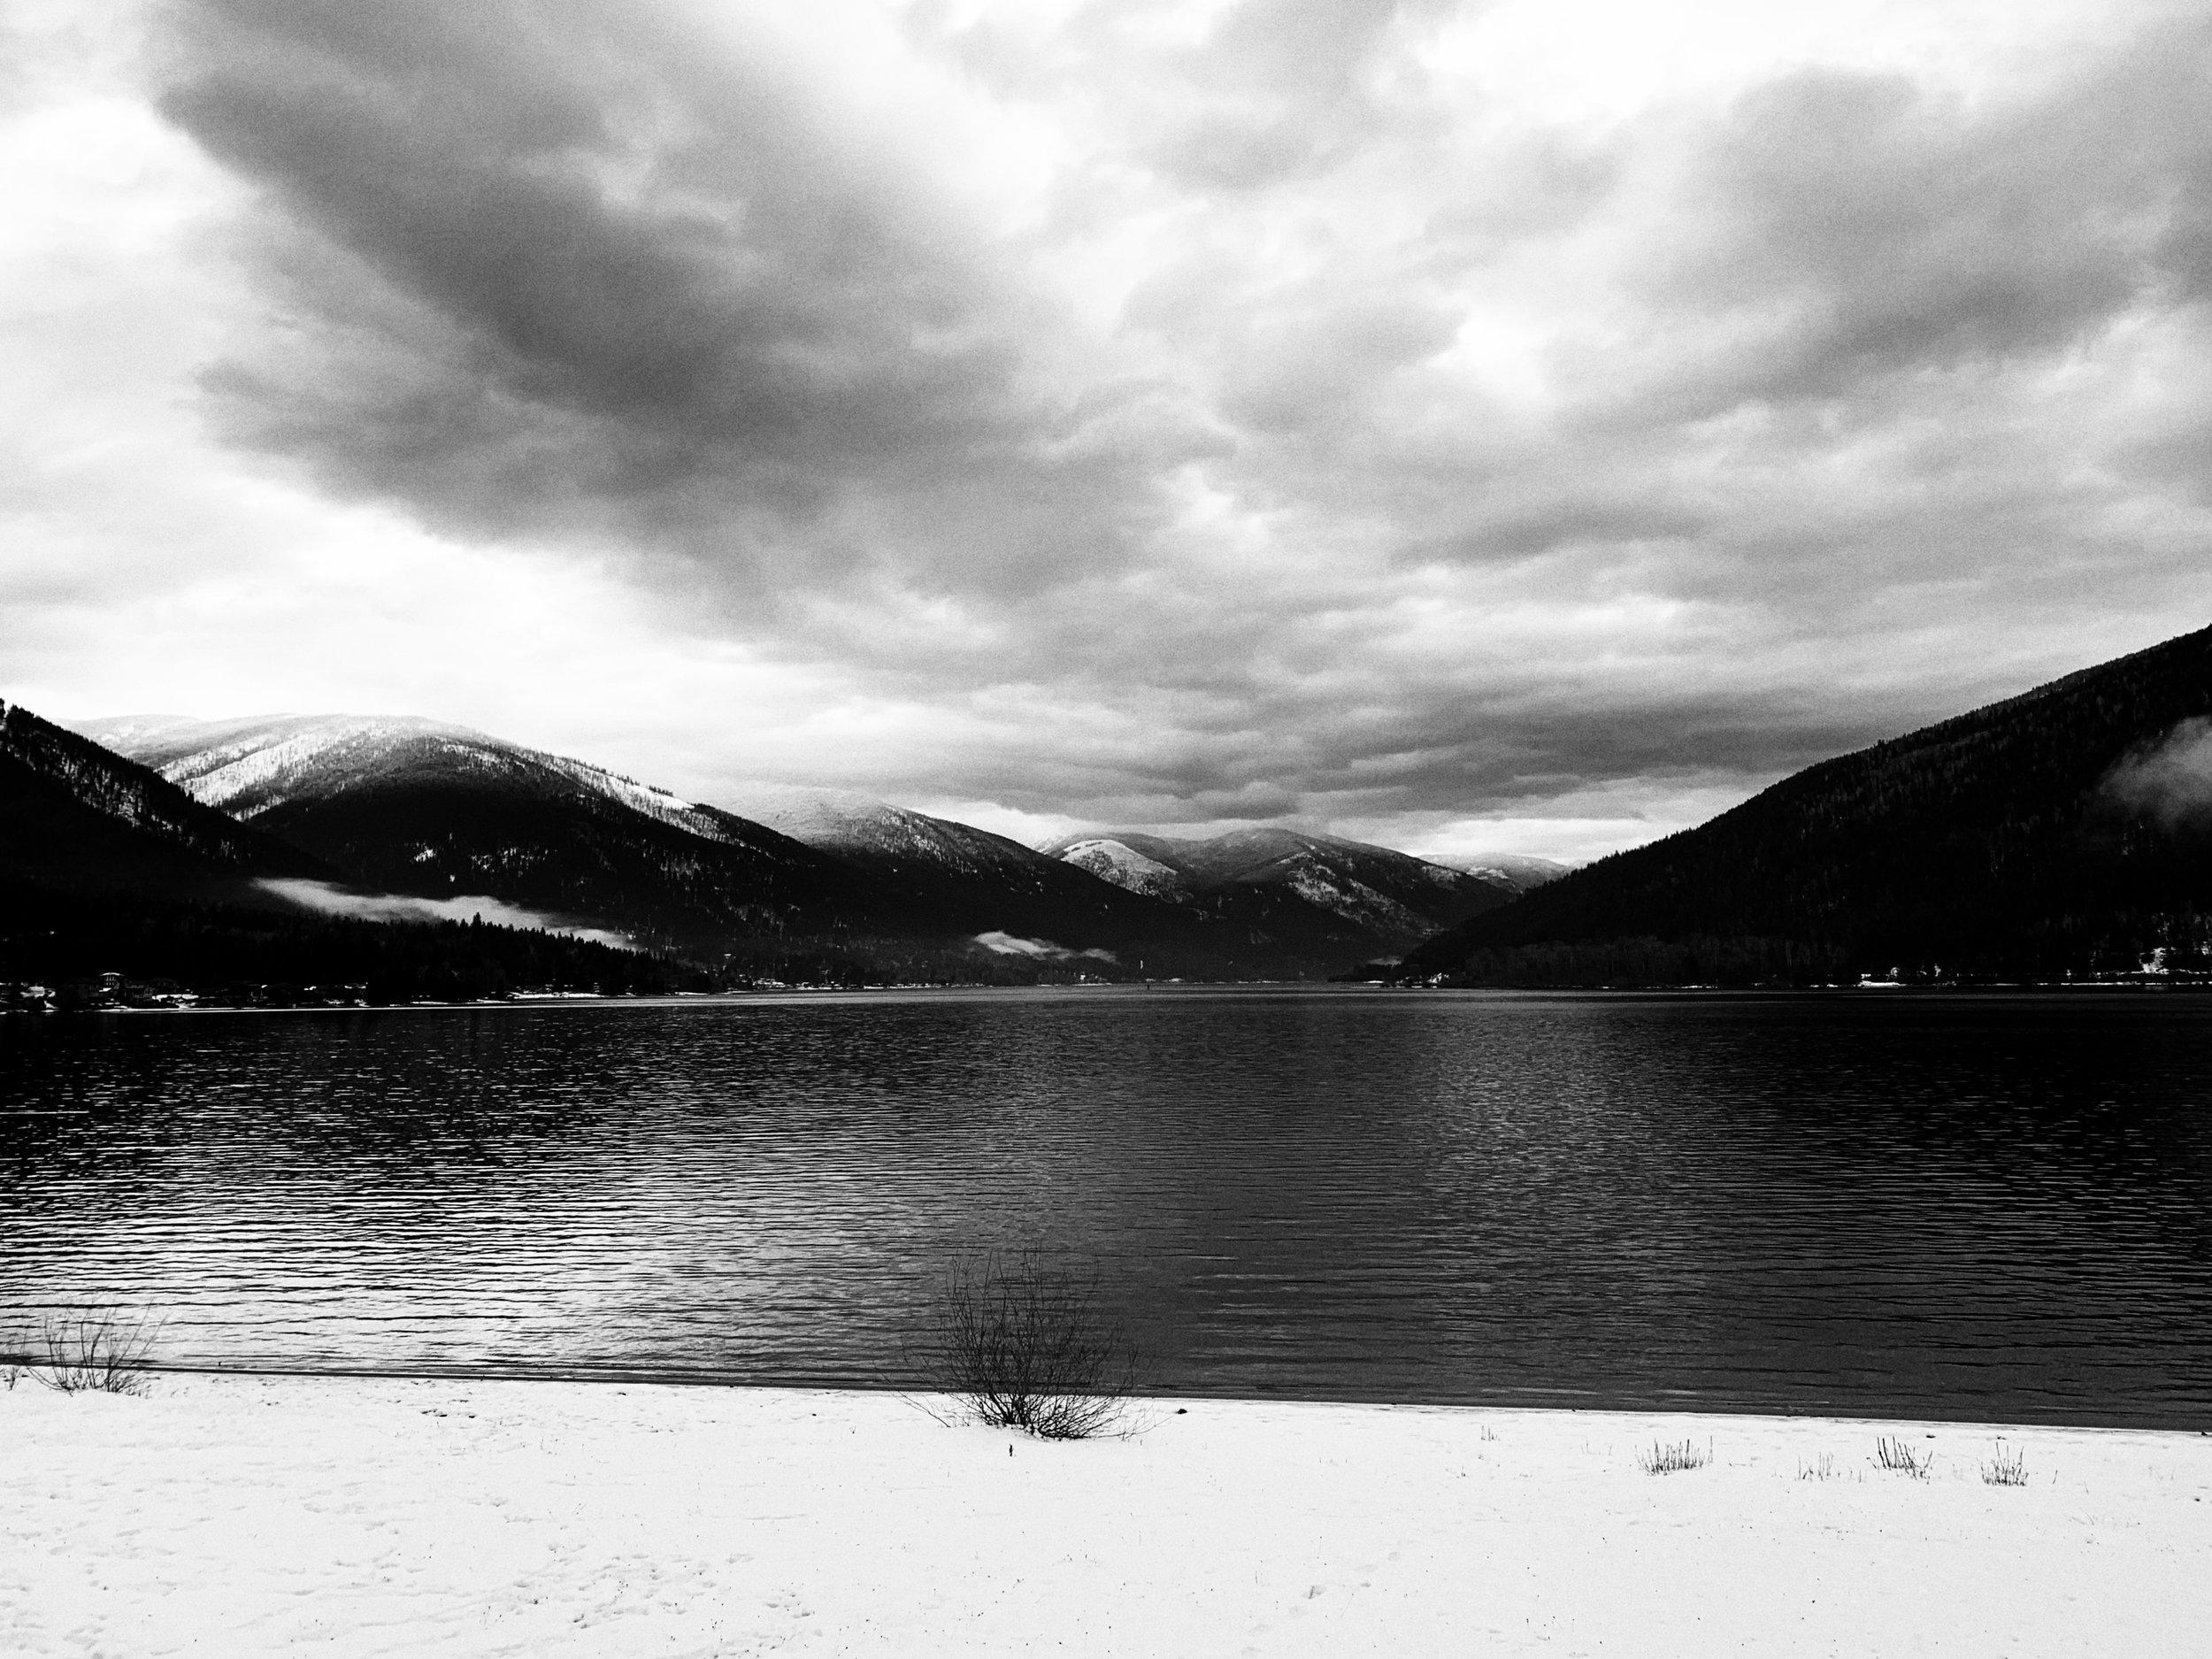 Kootenay Lake, British Columbia, site of my backyard polar plunge